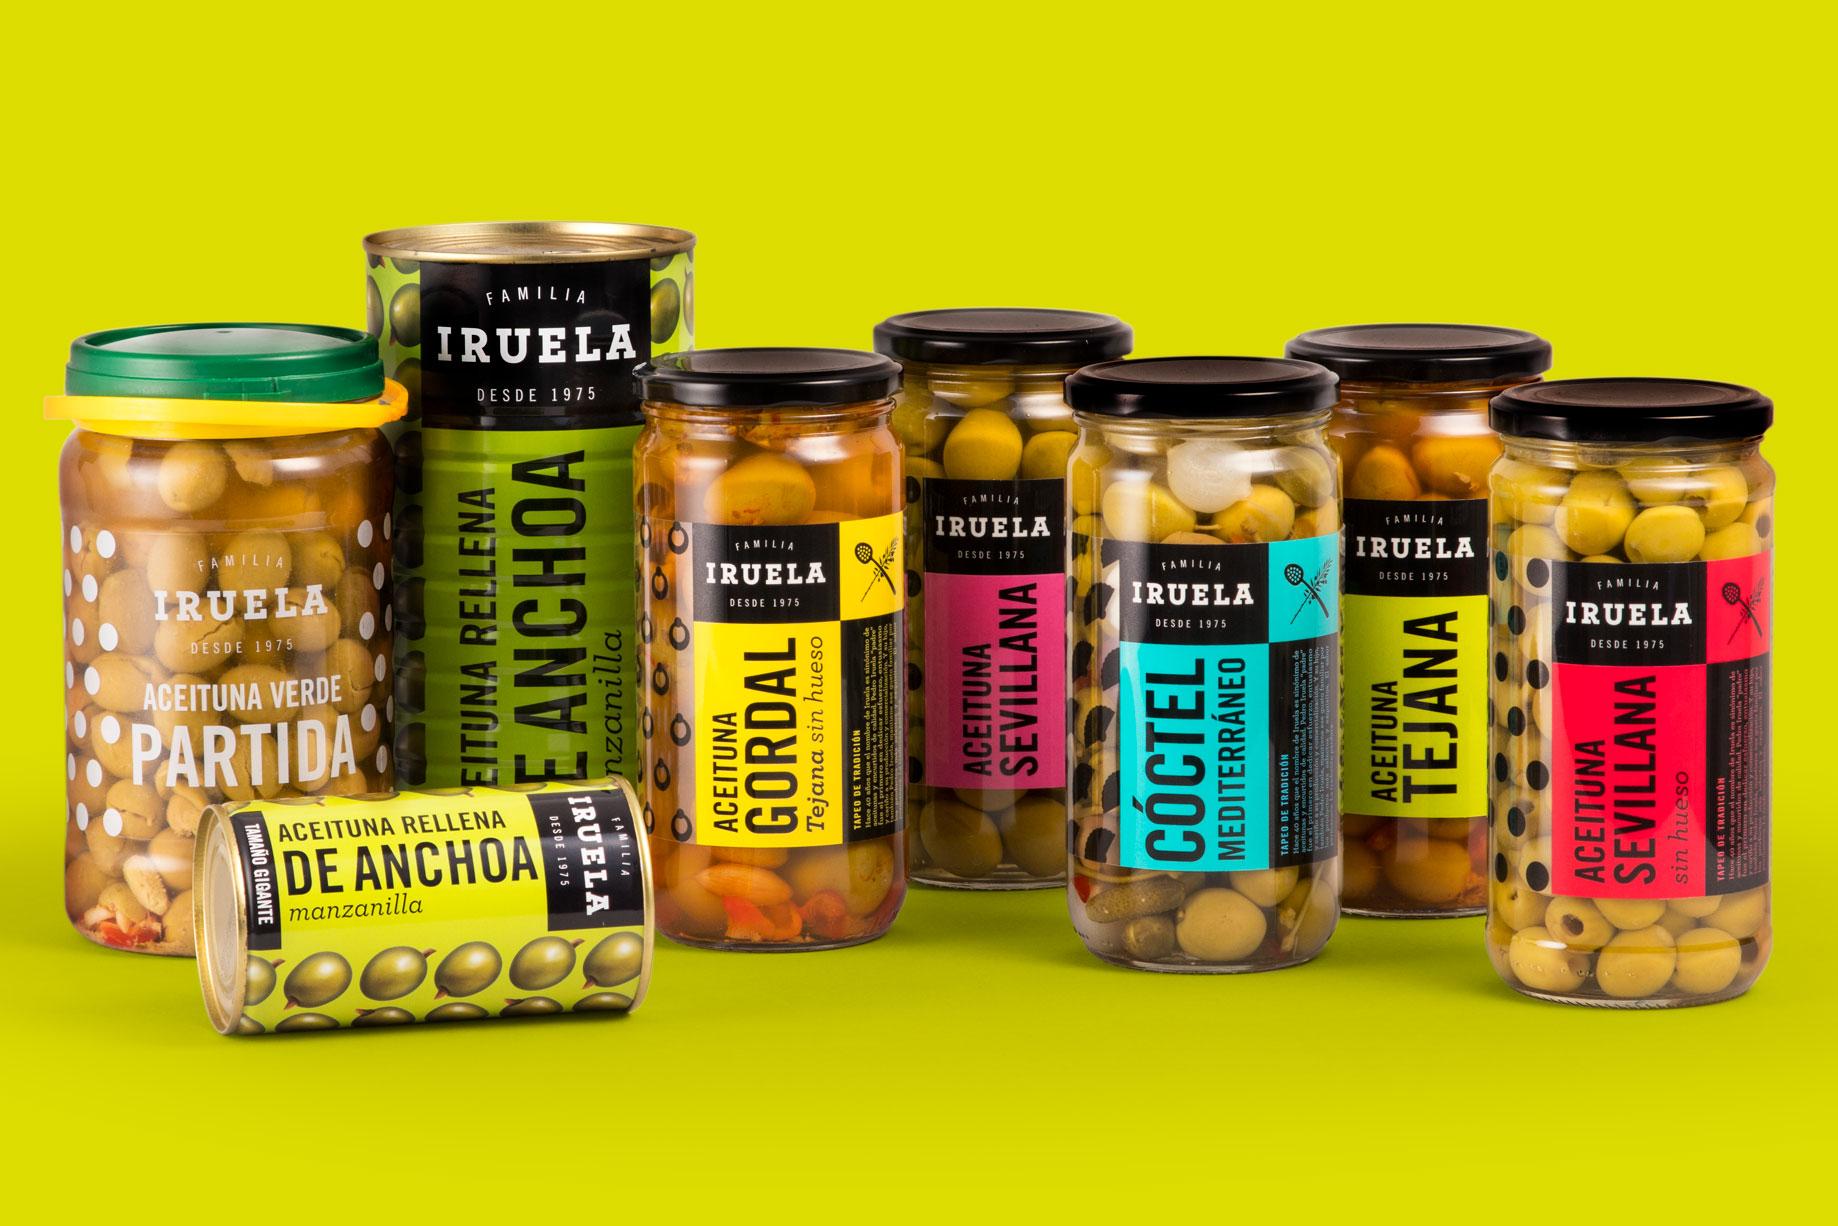 Iruela branding identidad corporativa packaging etiquetas diseño gráfico Vibranding